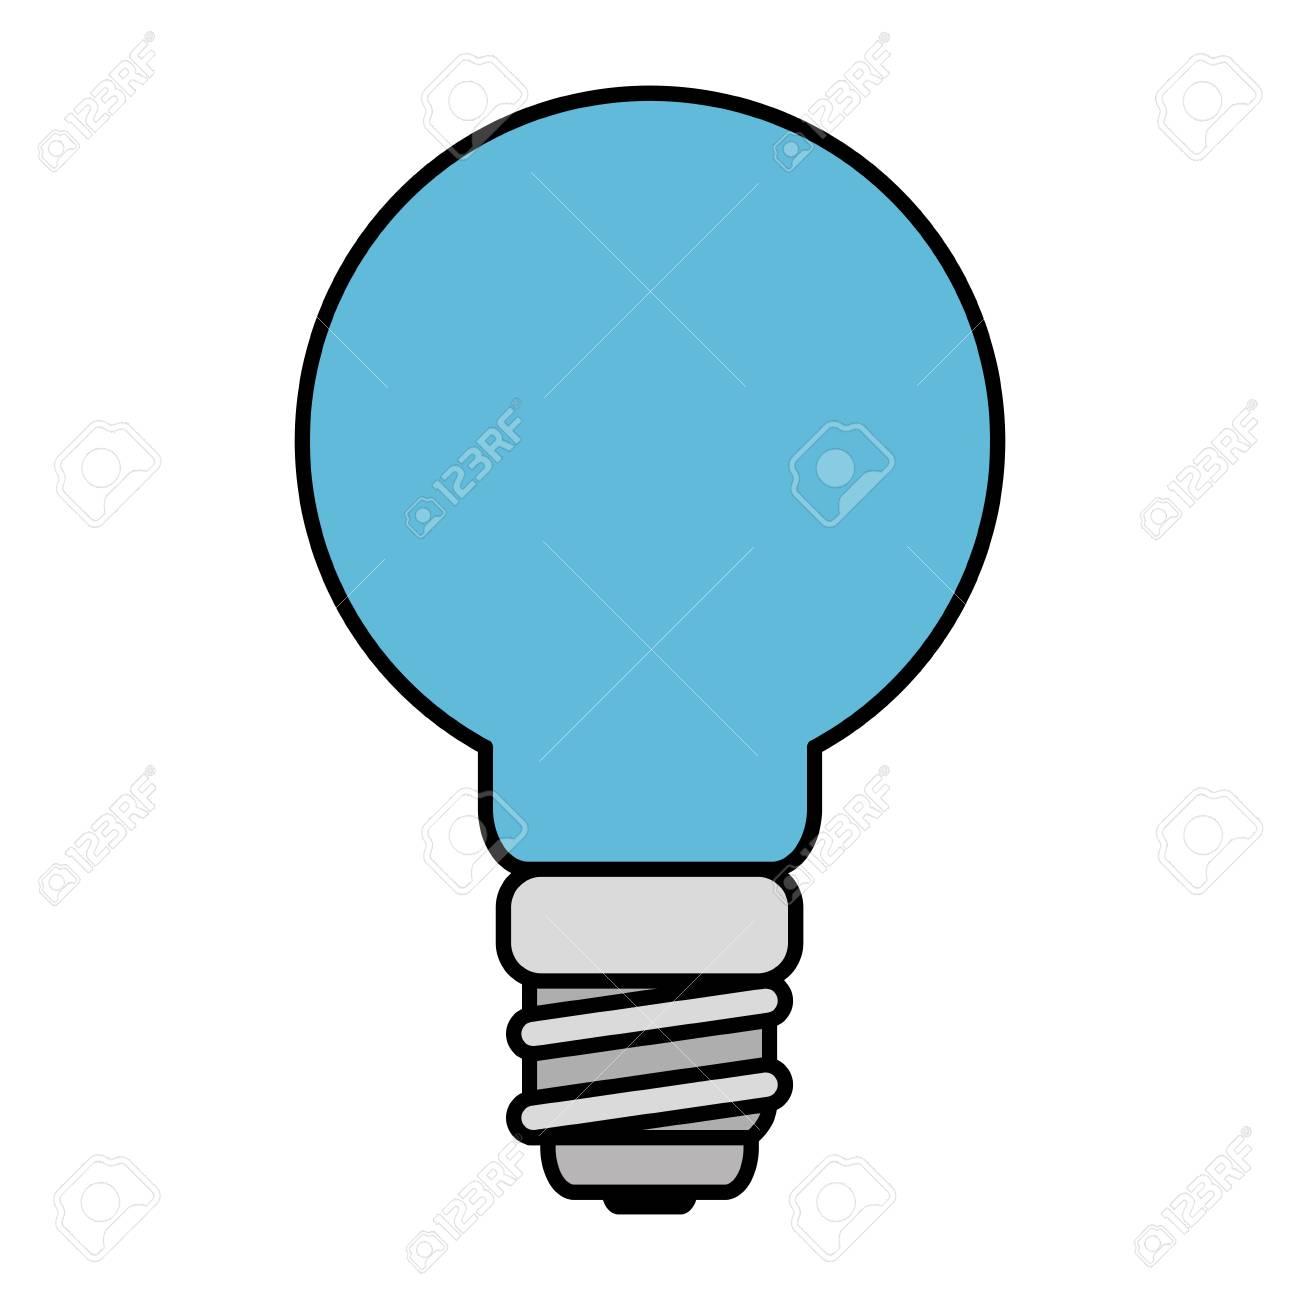 saver bulb energy icon vector illustration design - 122760707